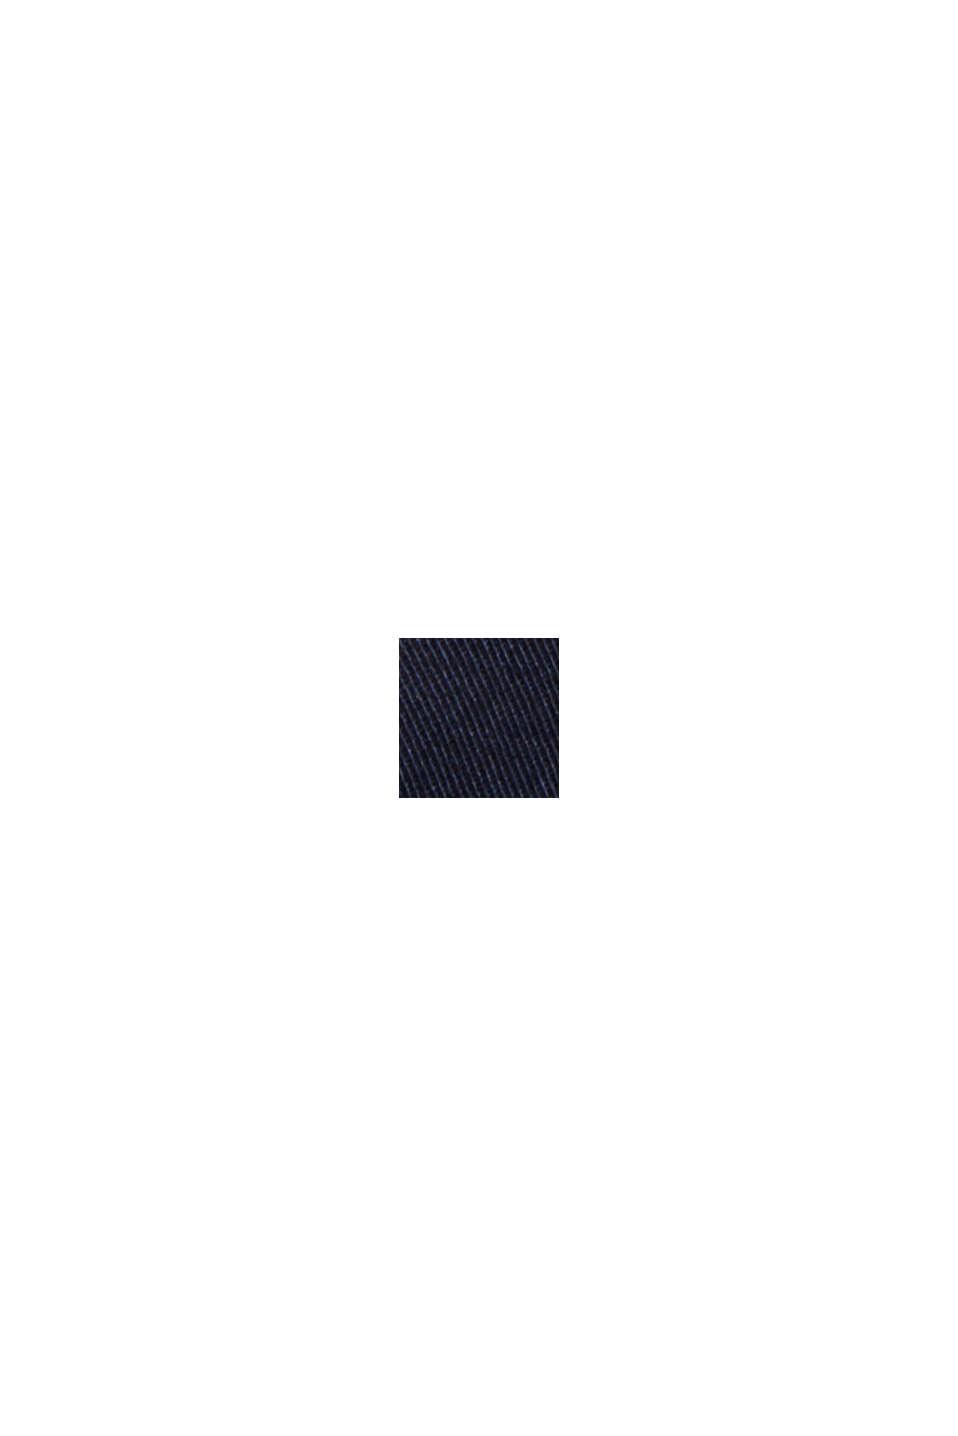 Zkrácené kalhoty s bio bavlnou a vlákny COOLMAX®, DARK BLUE, swatch